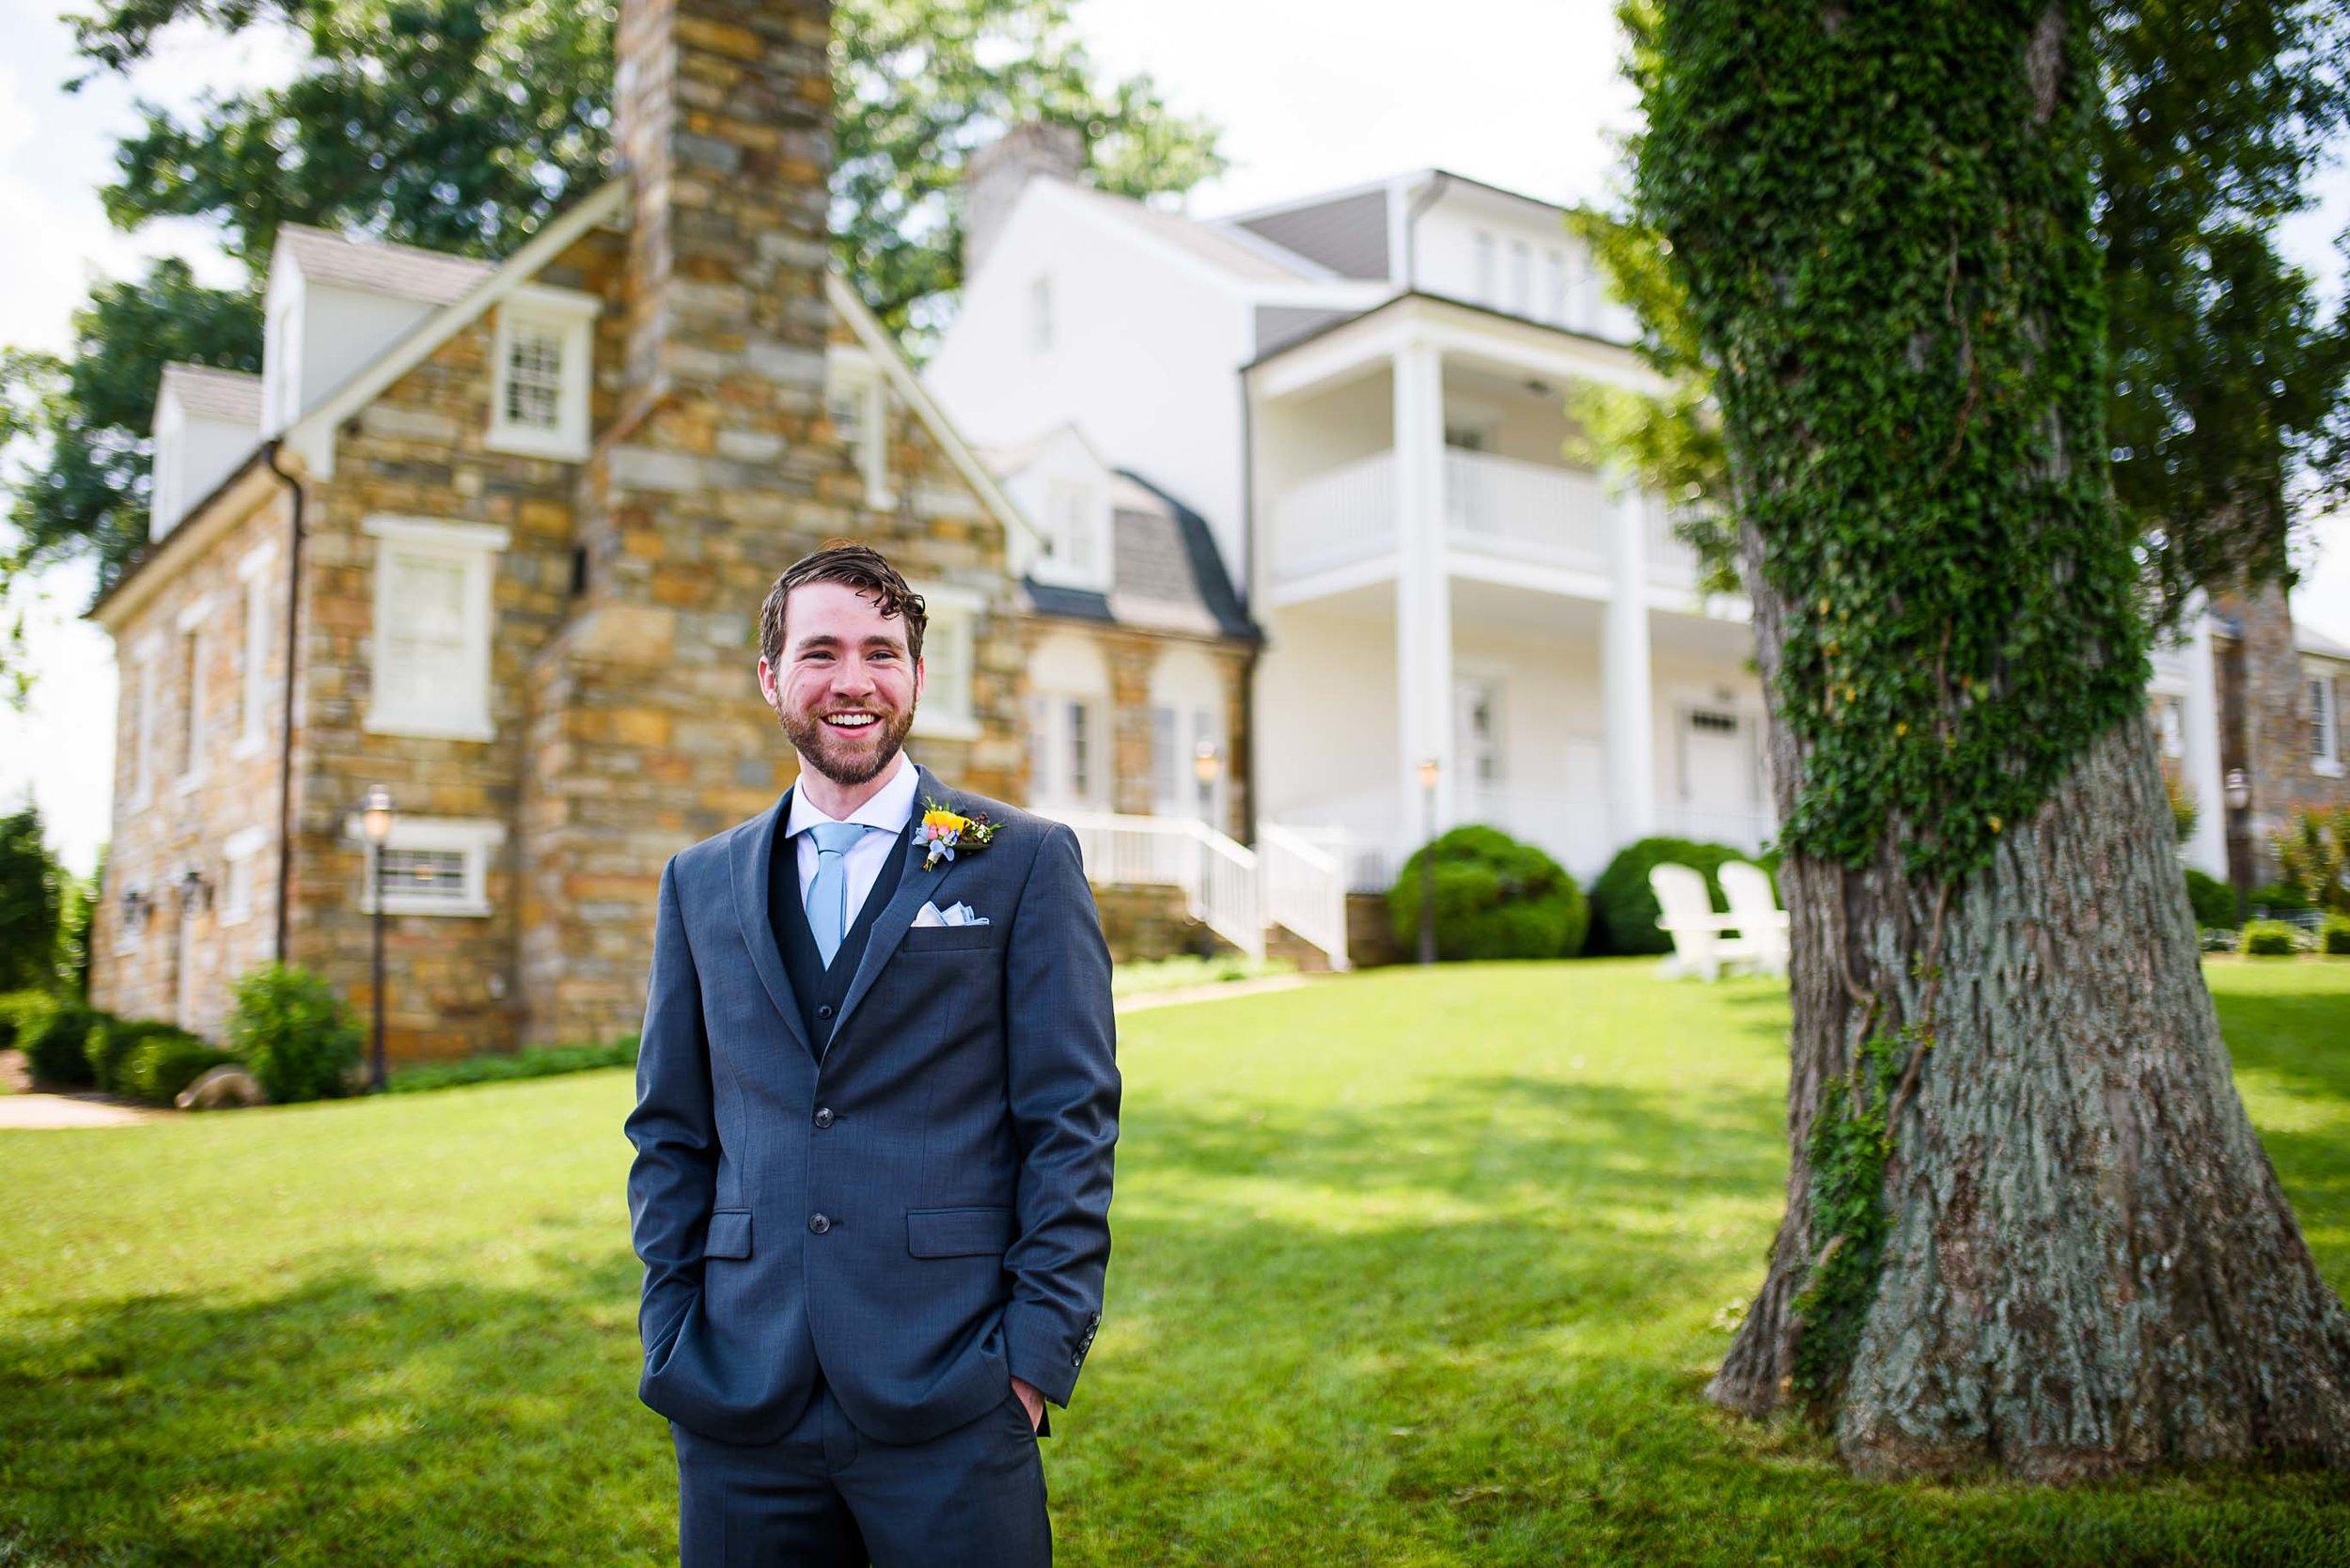 Evergreen Country Club wedding photos11.jpg